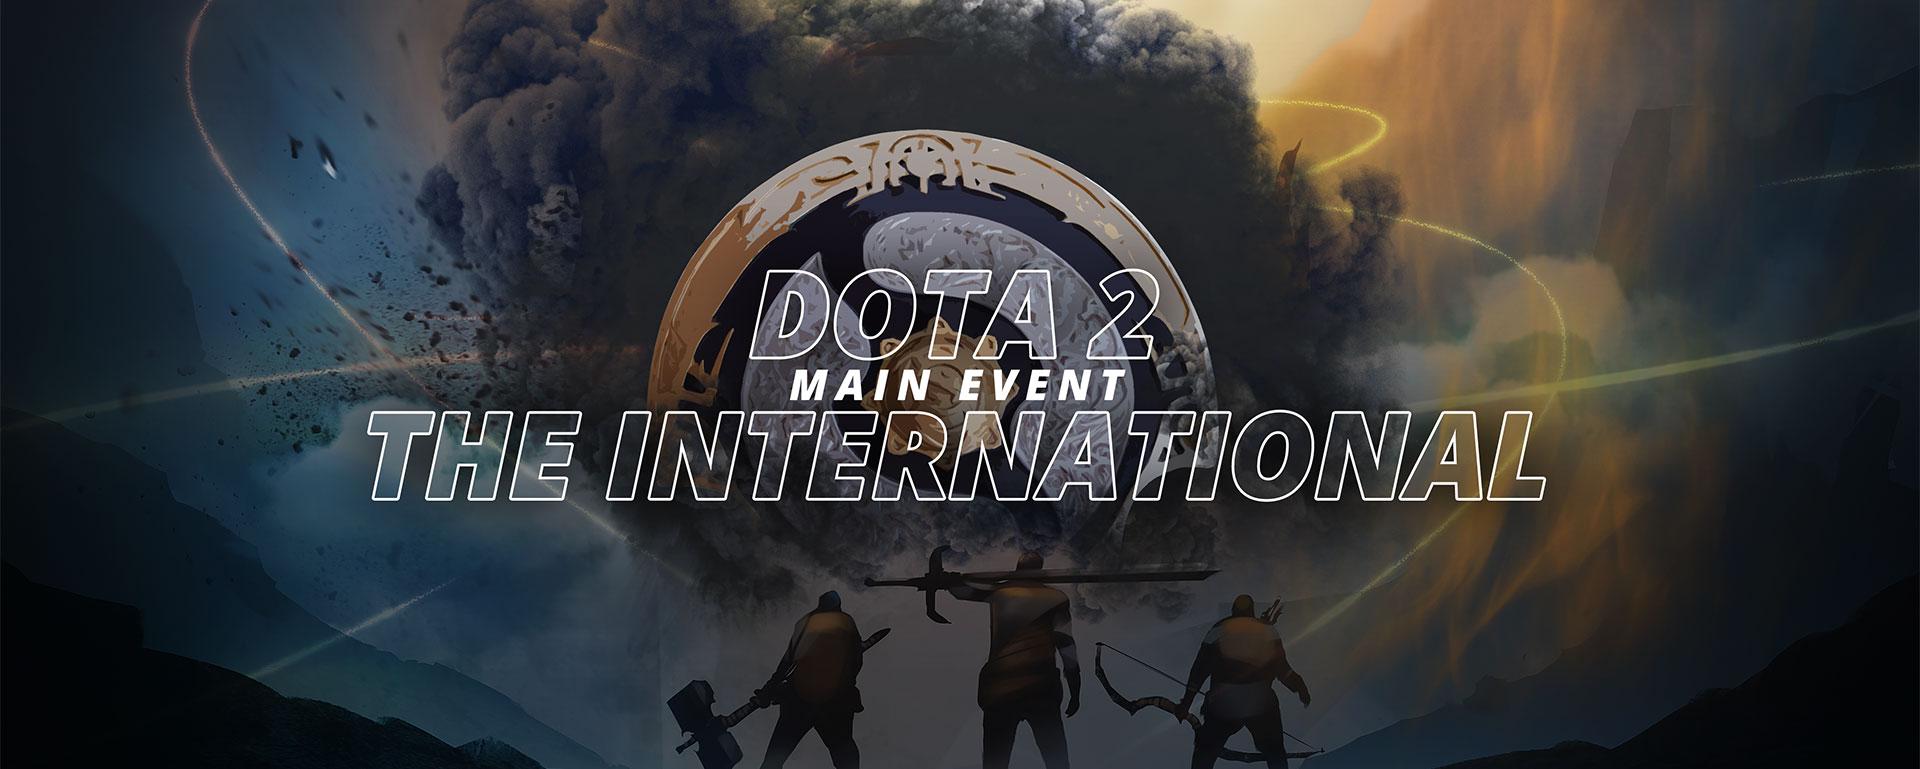 DOTA 2 — THE INTERNATIONAL 10 — MAIN EVENT